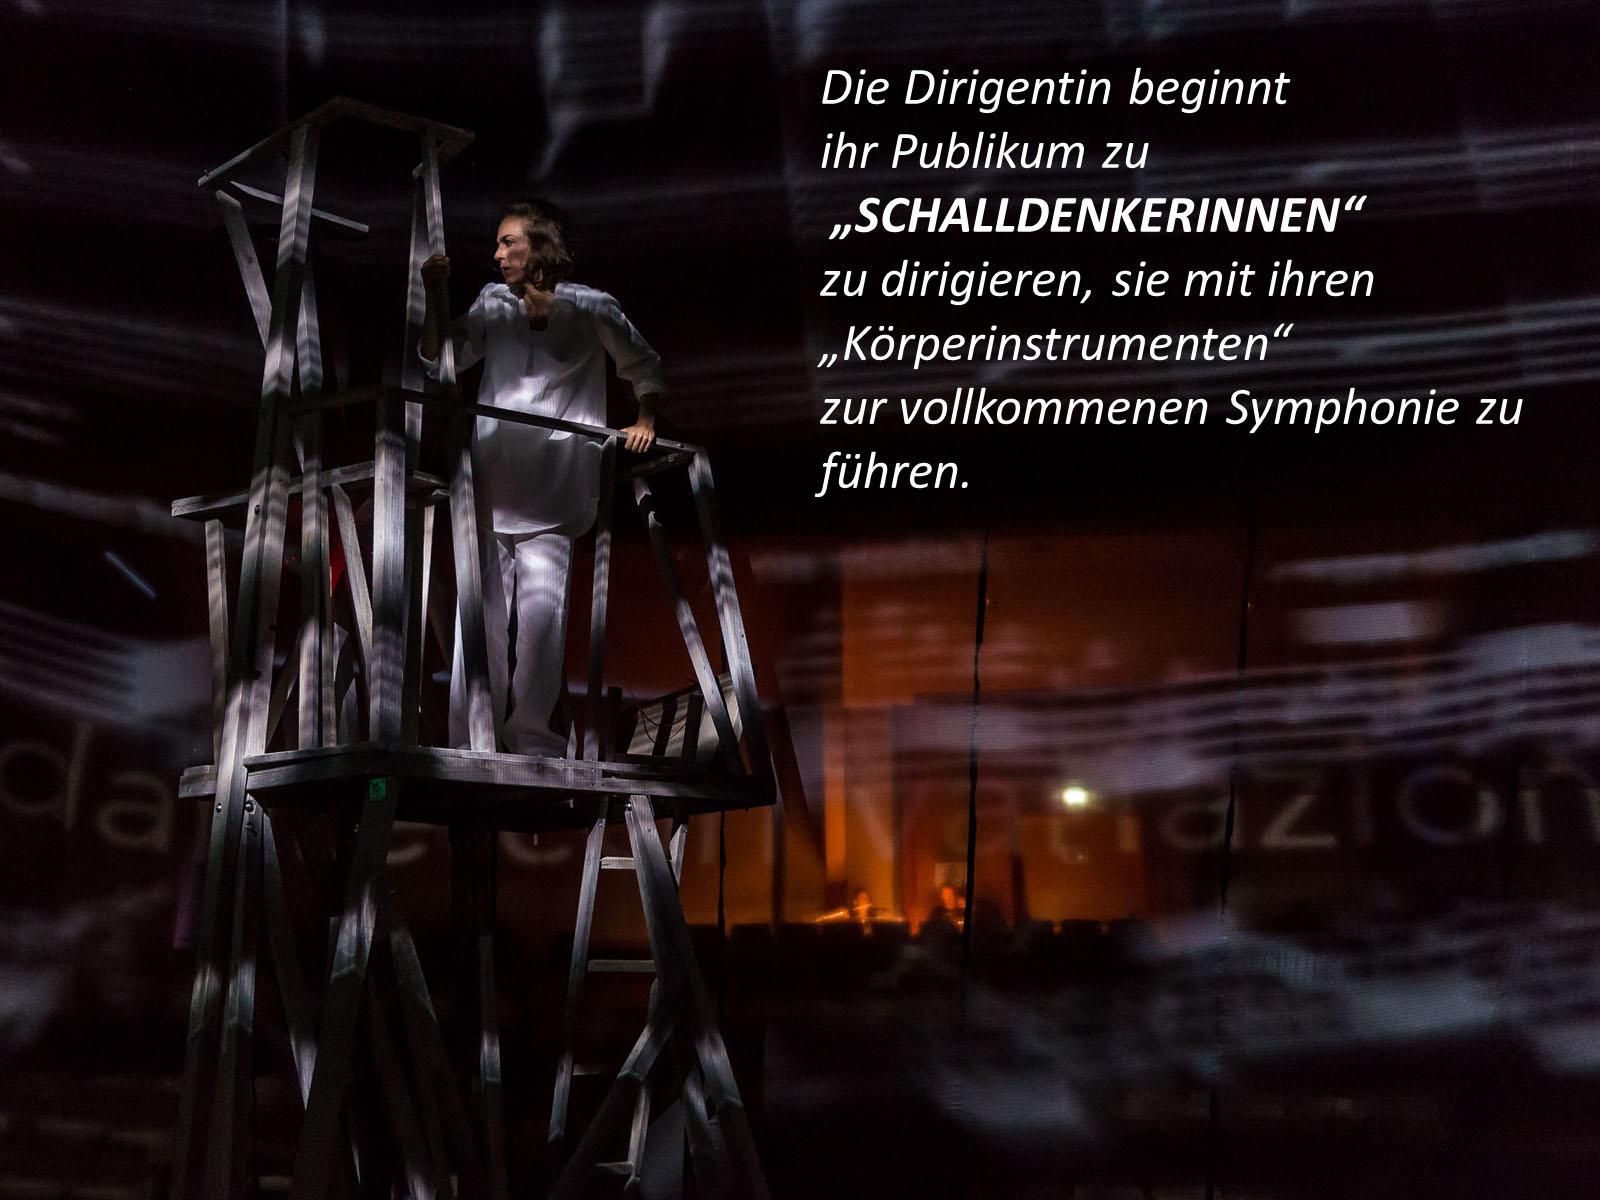 Chorphantasie | Odeïon Kulturforum Salzburg | 2014-09-18 bis 2014-10-23 | Foto © Albert Moser | 4